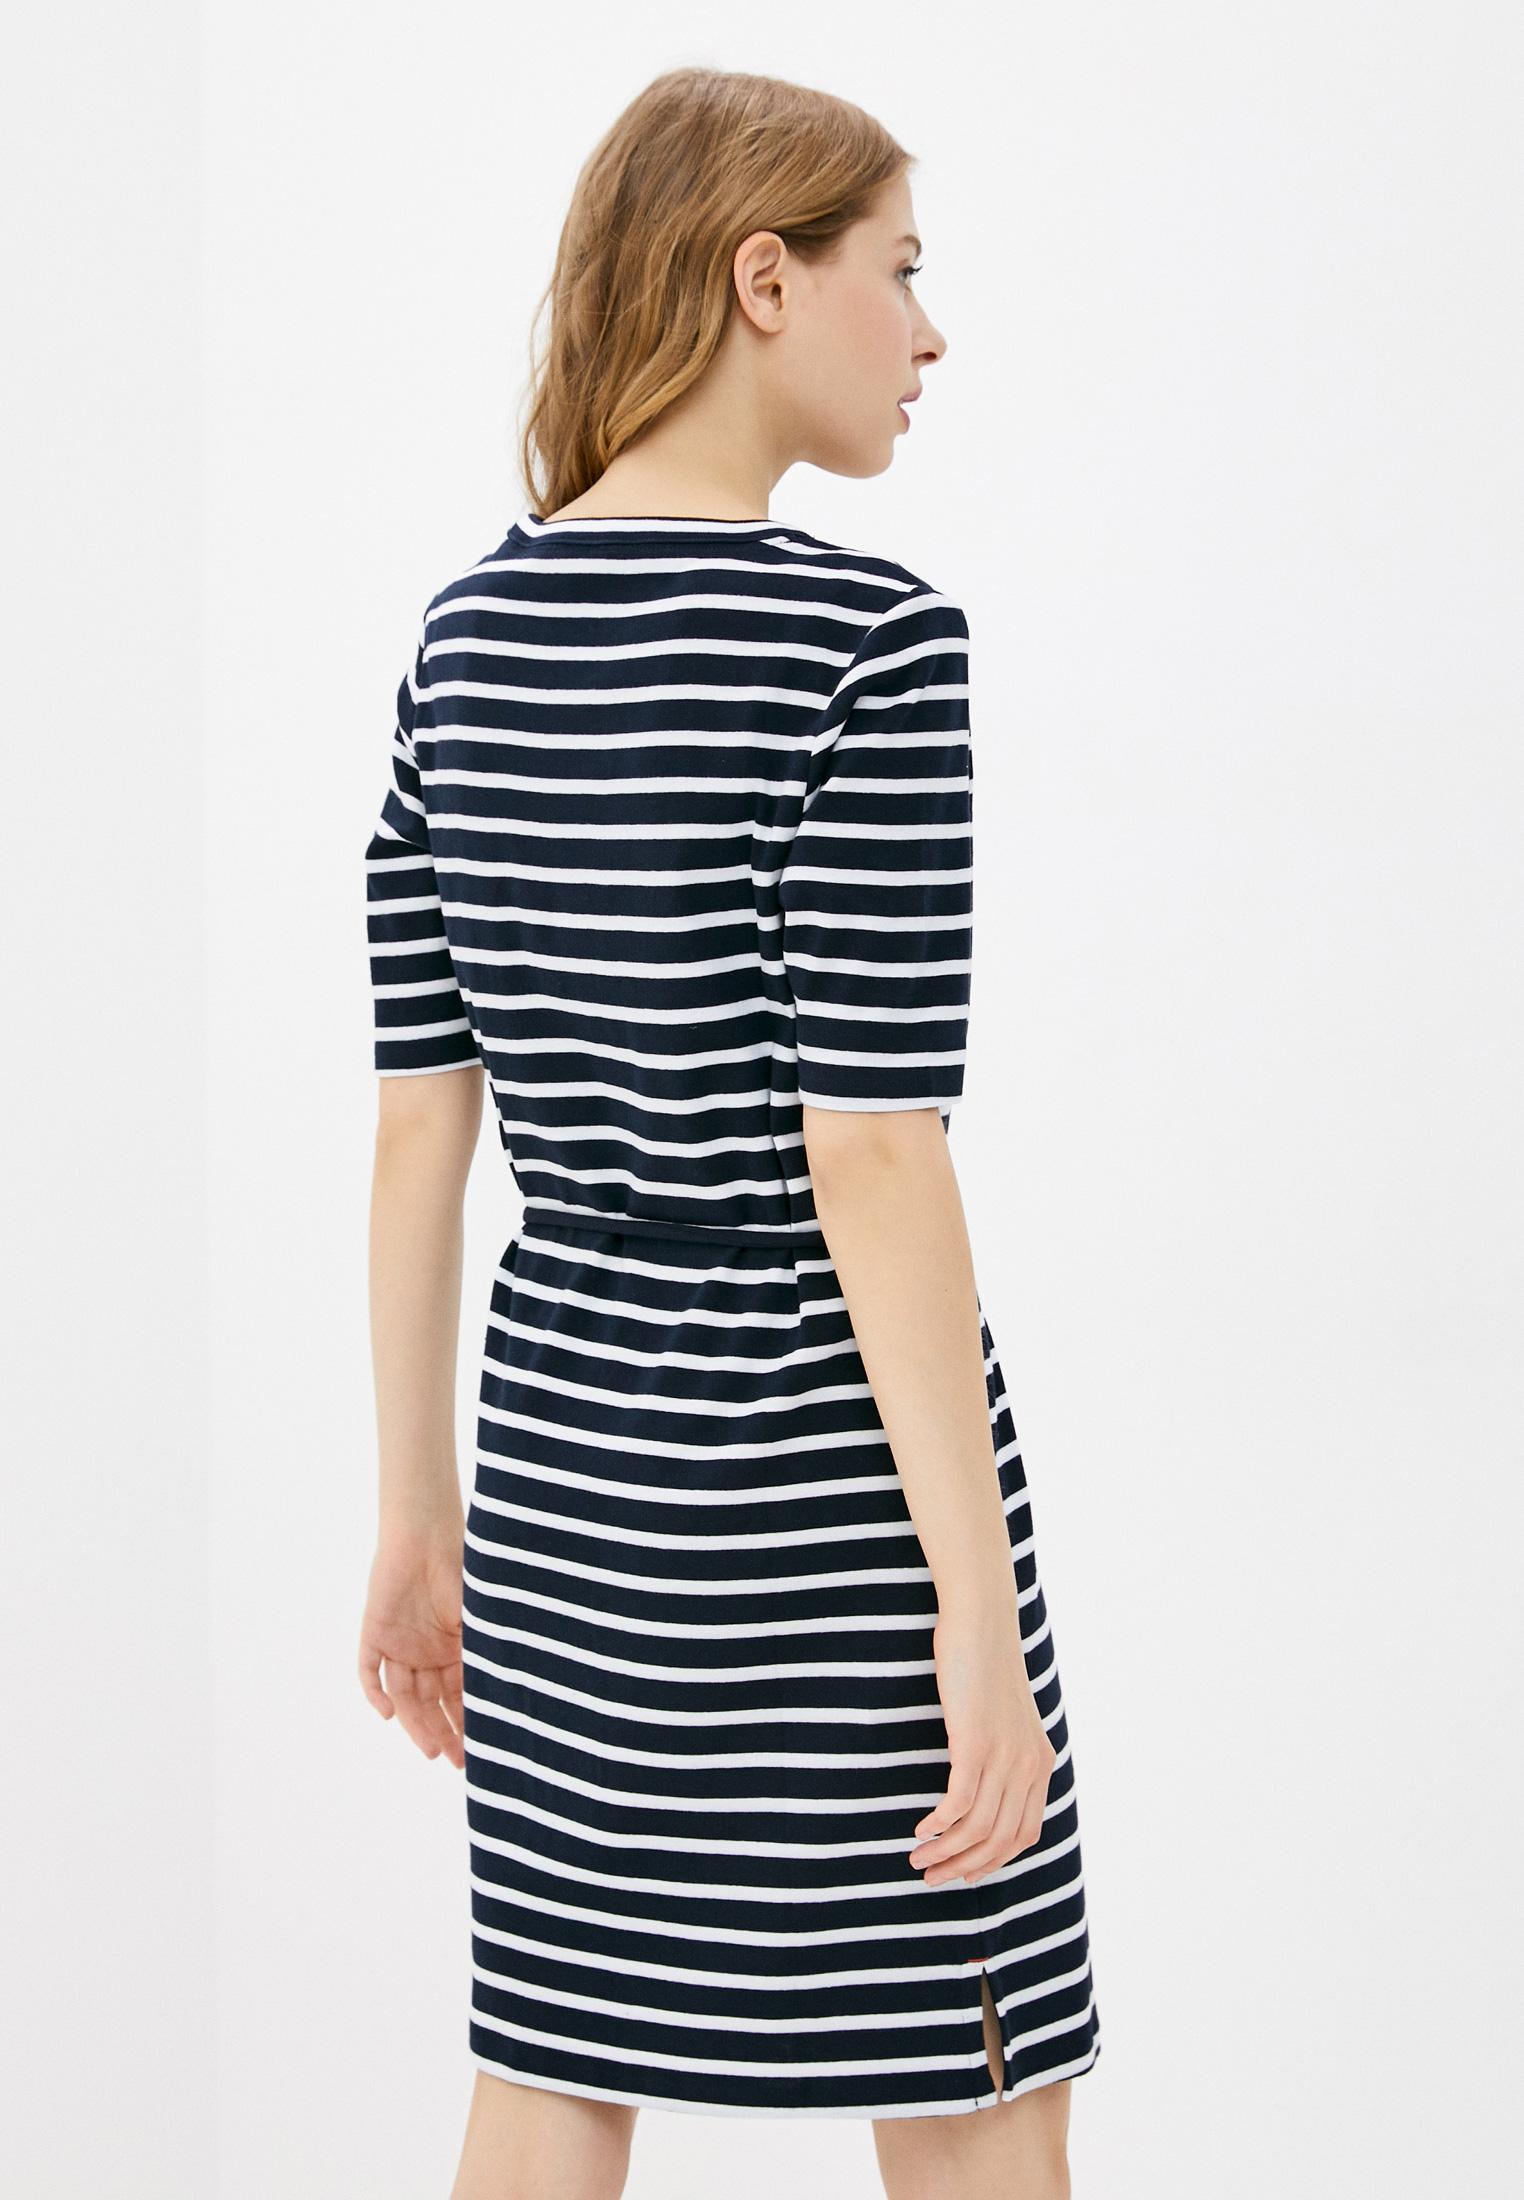 Платье Tommy Hilfiger (Томми Хилфигер) WW0WW30375: изображение 3